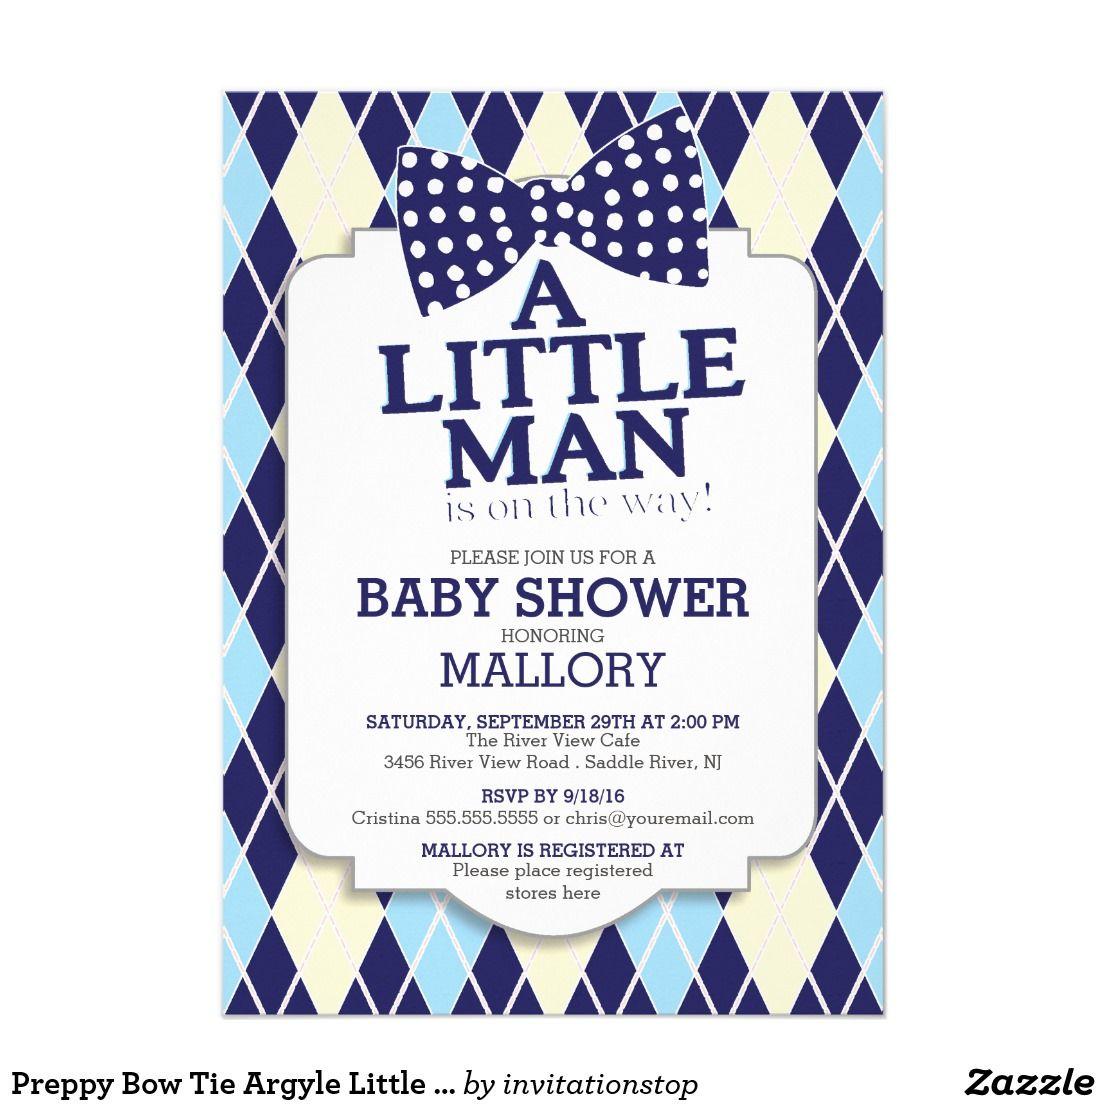 Printable Birthday Party Invitation Card Detroit Lions: Preppy Bow Tie Argyle Little Man Boys Baby Shower